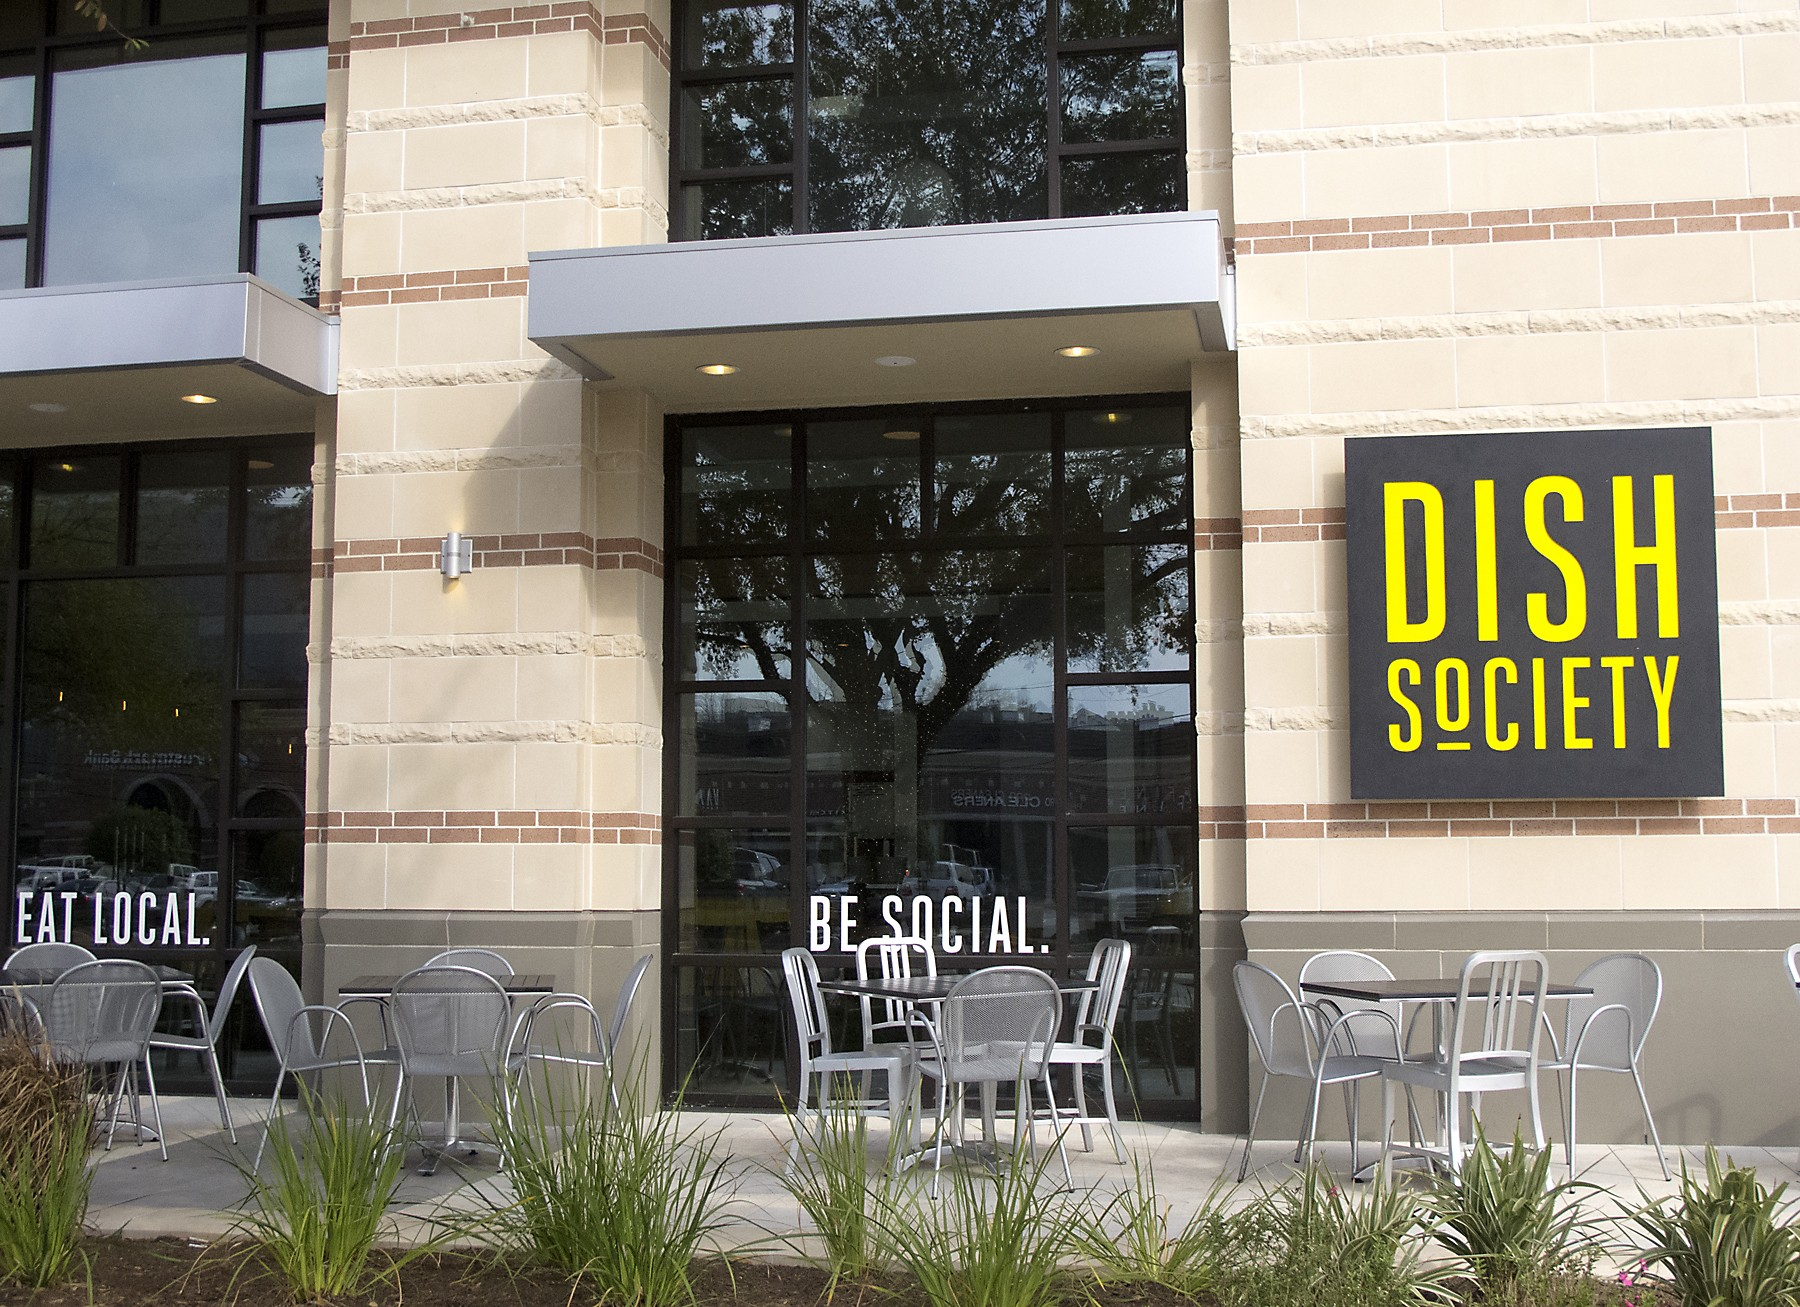 Dish Society Galleria